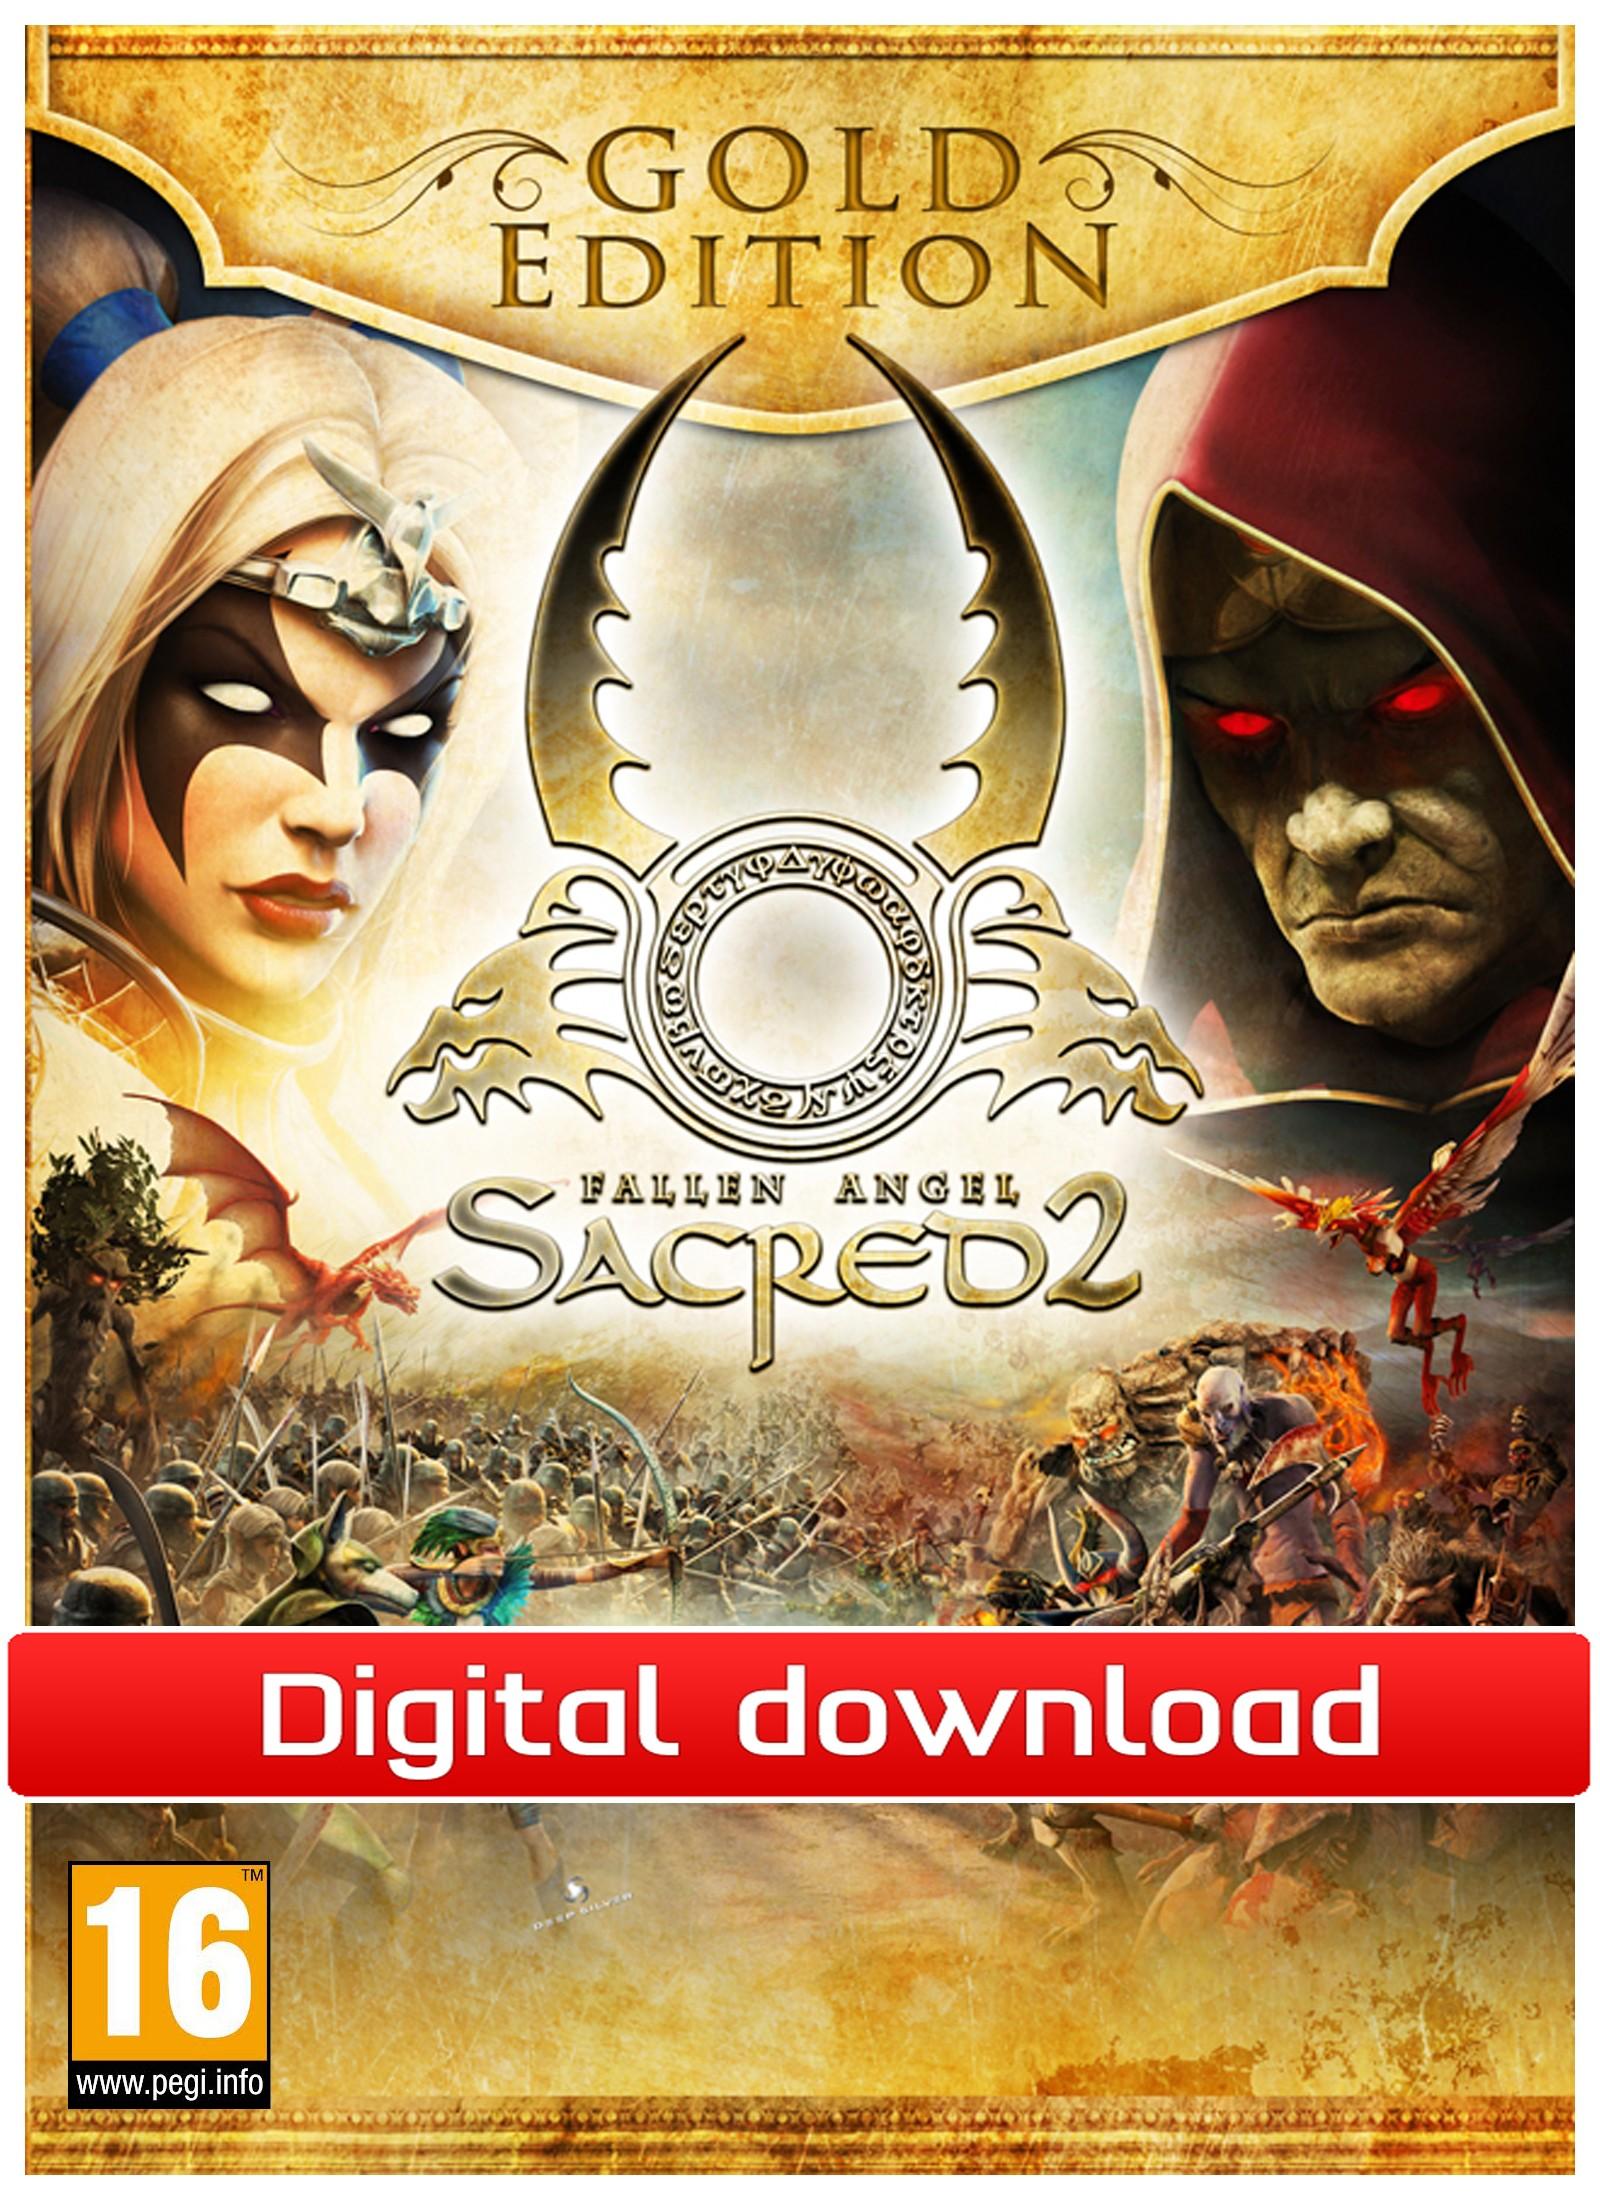 Sacred 2 Gold (PC nedlastning) PCDD26926